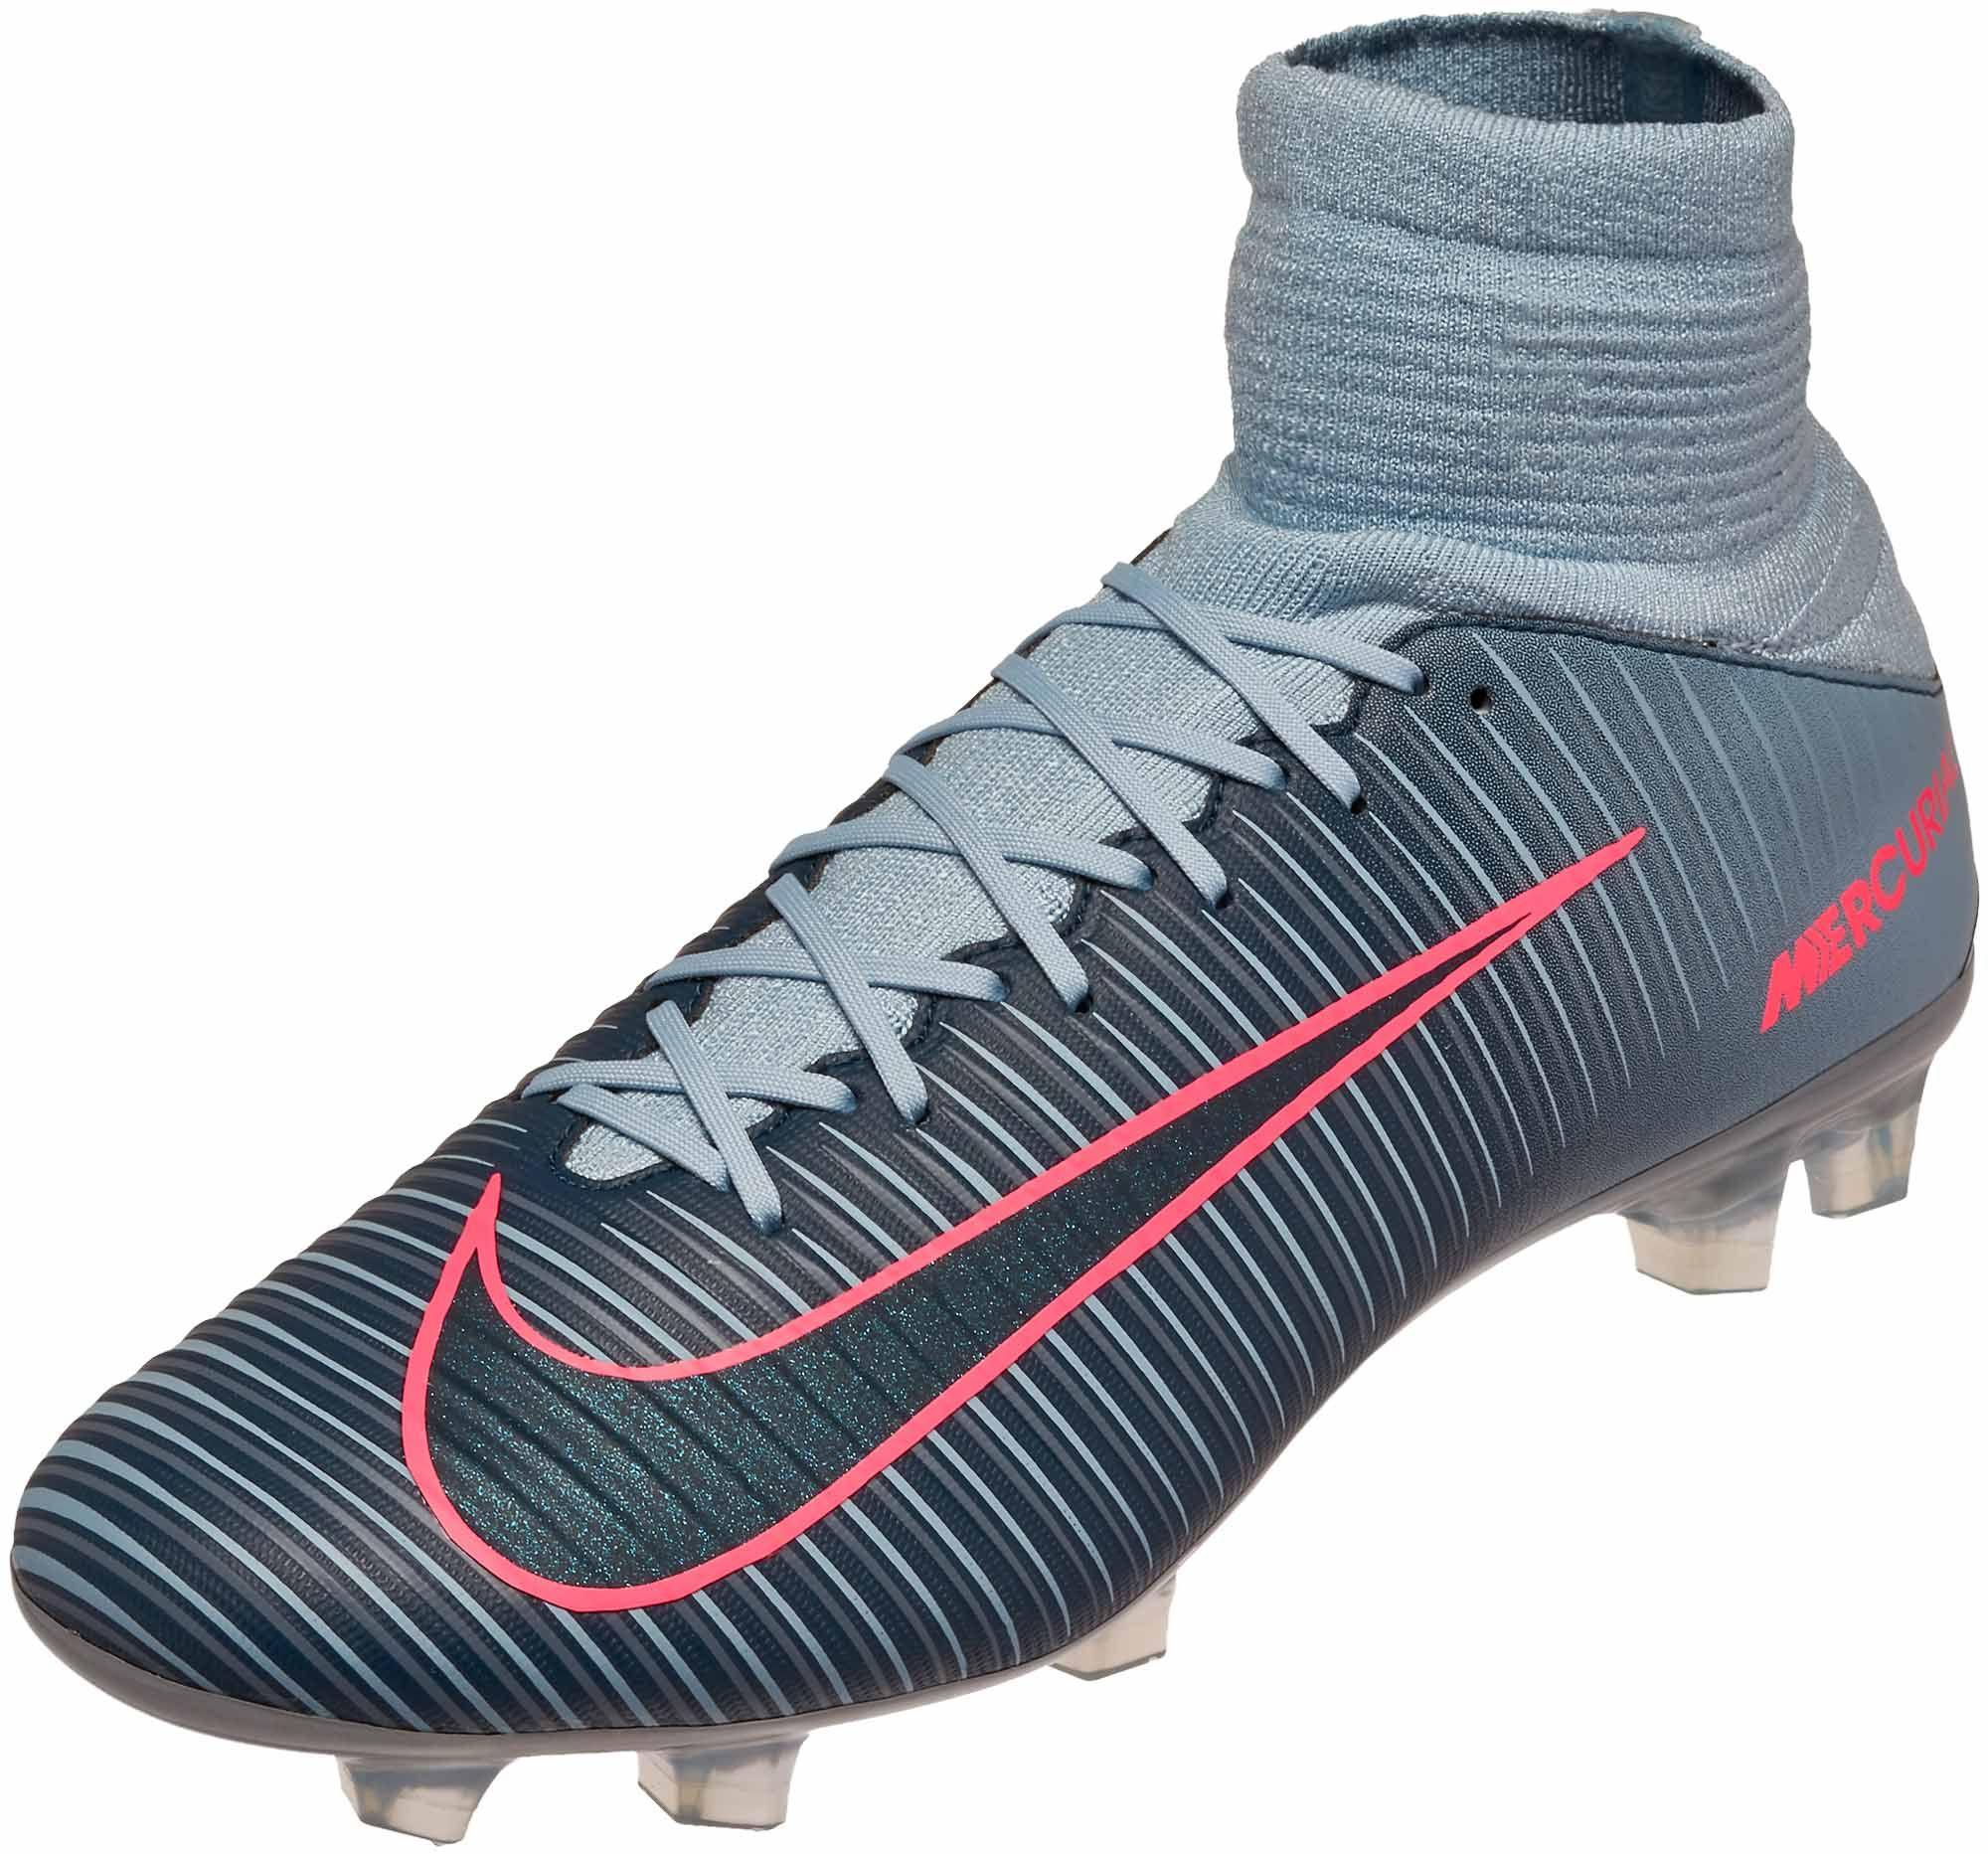 Nike Mercurial Veloce III DF FG Soccer Cleats - SoccerPro.com